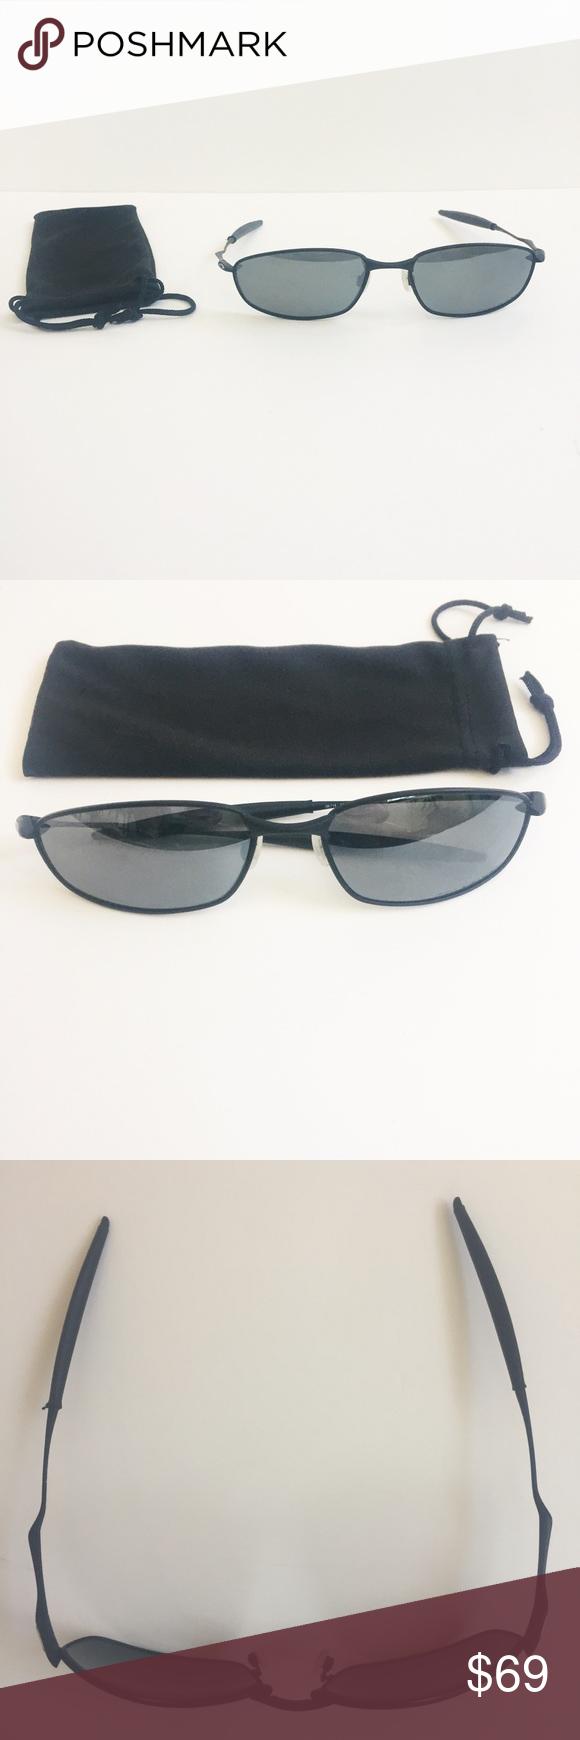 400fb480e81 Oakley Whisker T Sunglasses Polarized 60 19 05-715 Oakley Whisker T  Sunglasses Polarized